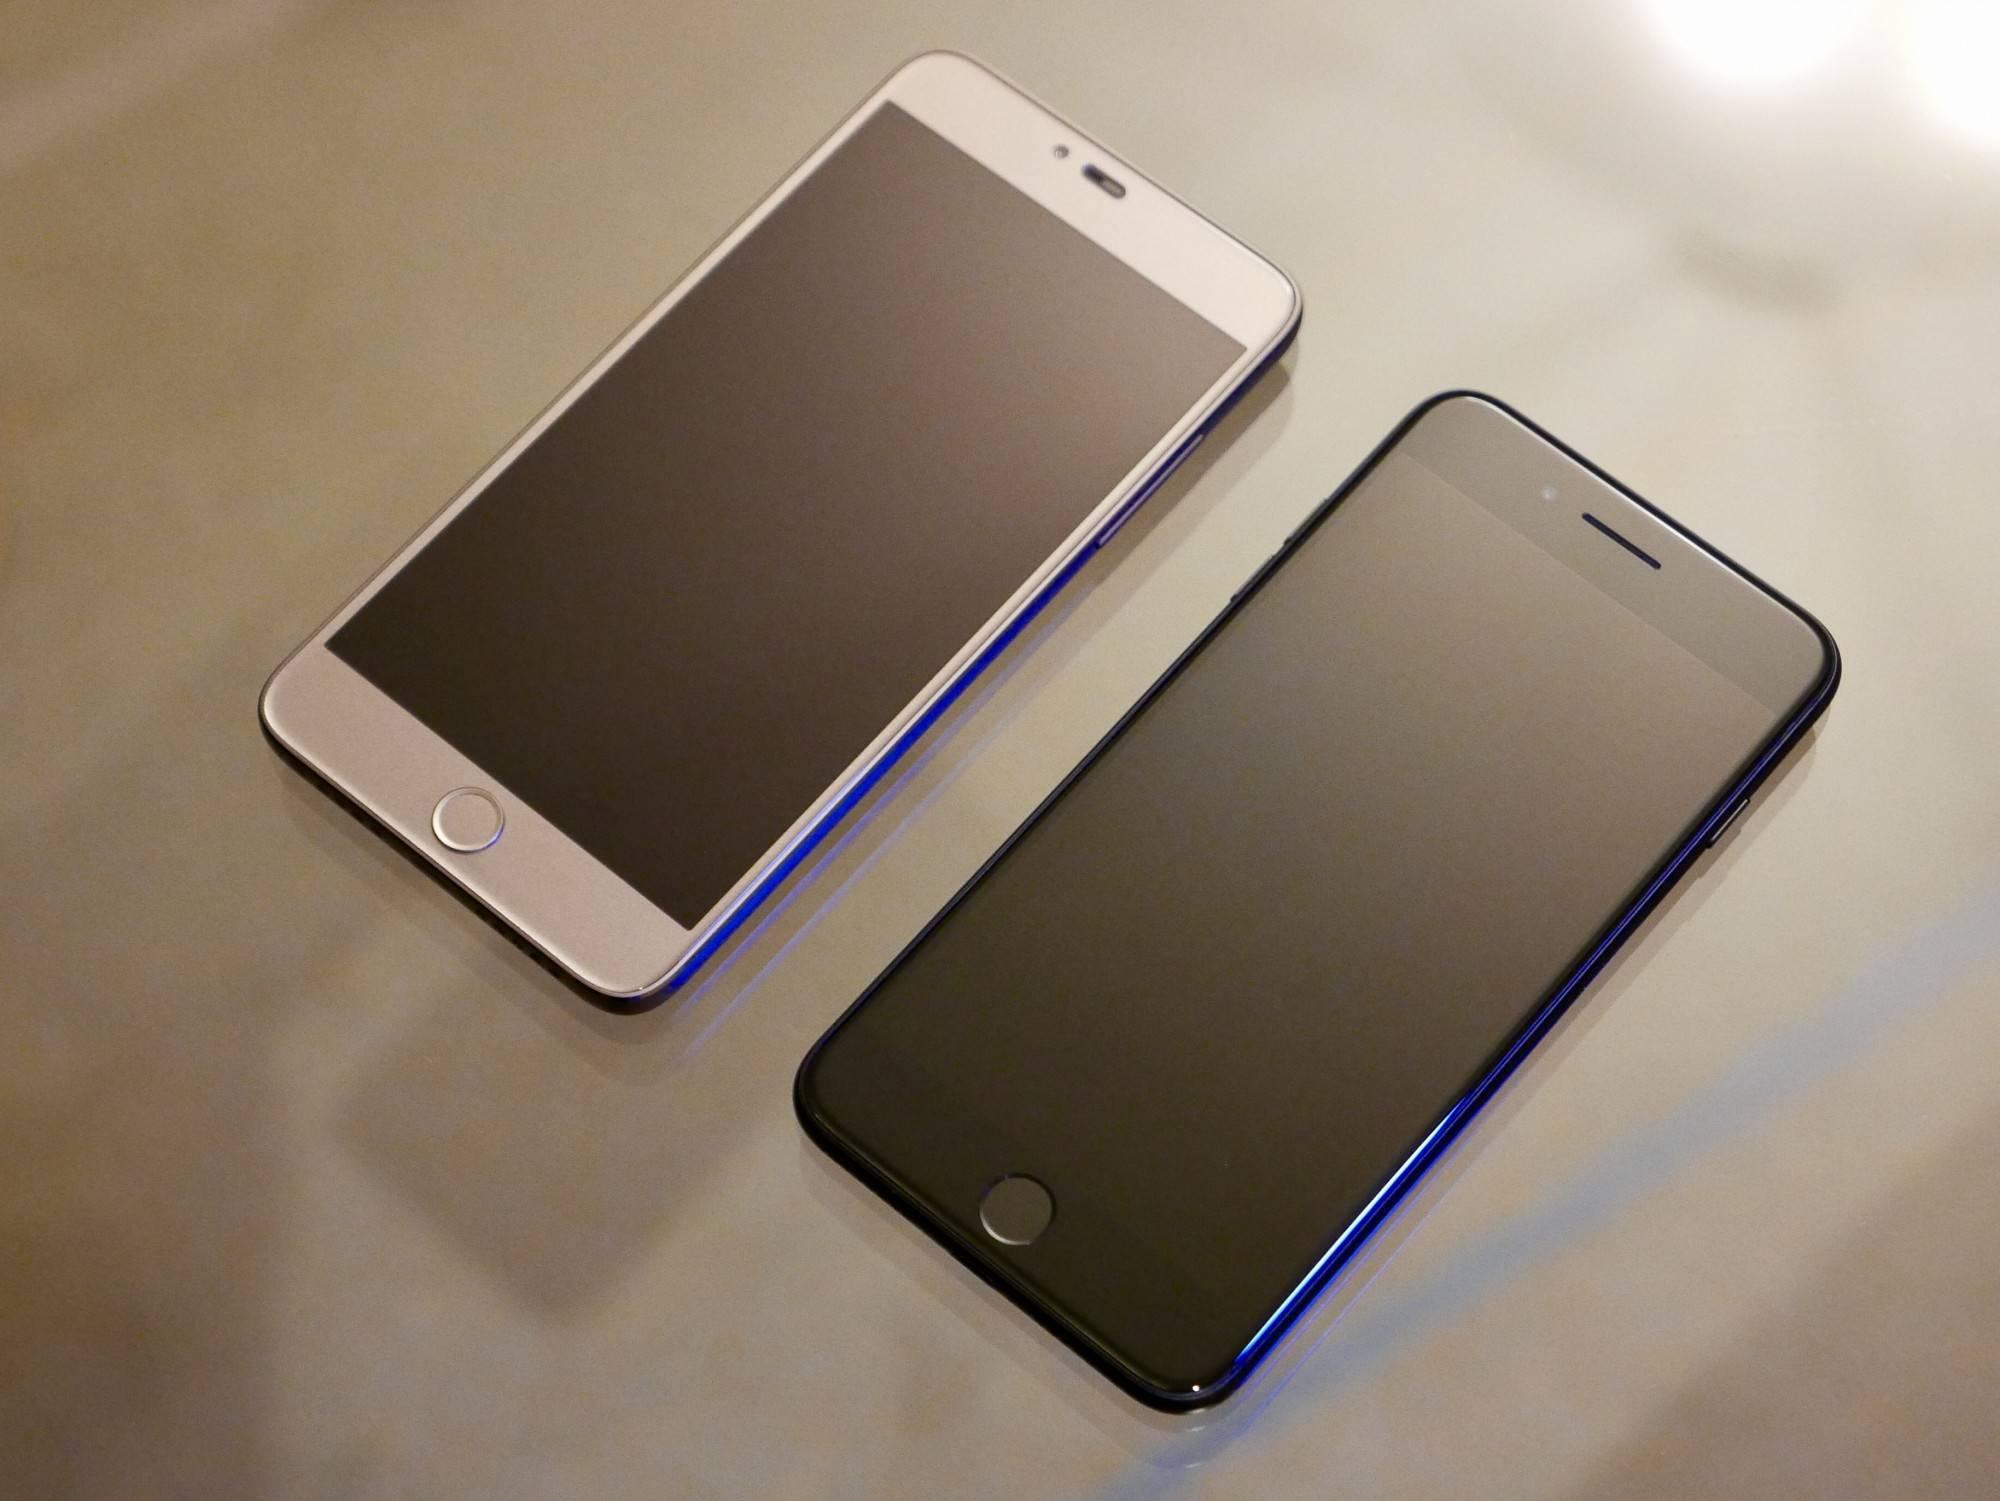 Smartisan M1 PingWest Photo by Hao Ying 10